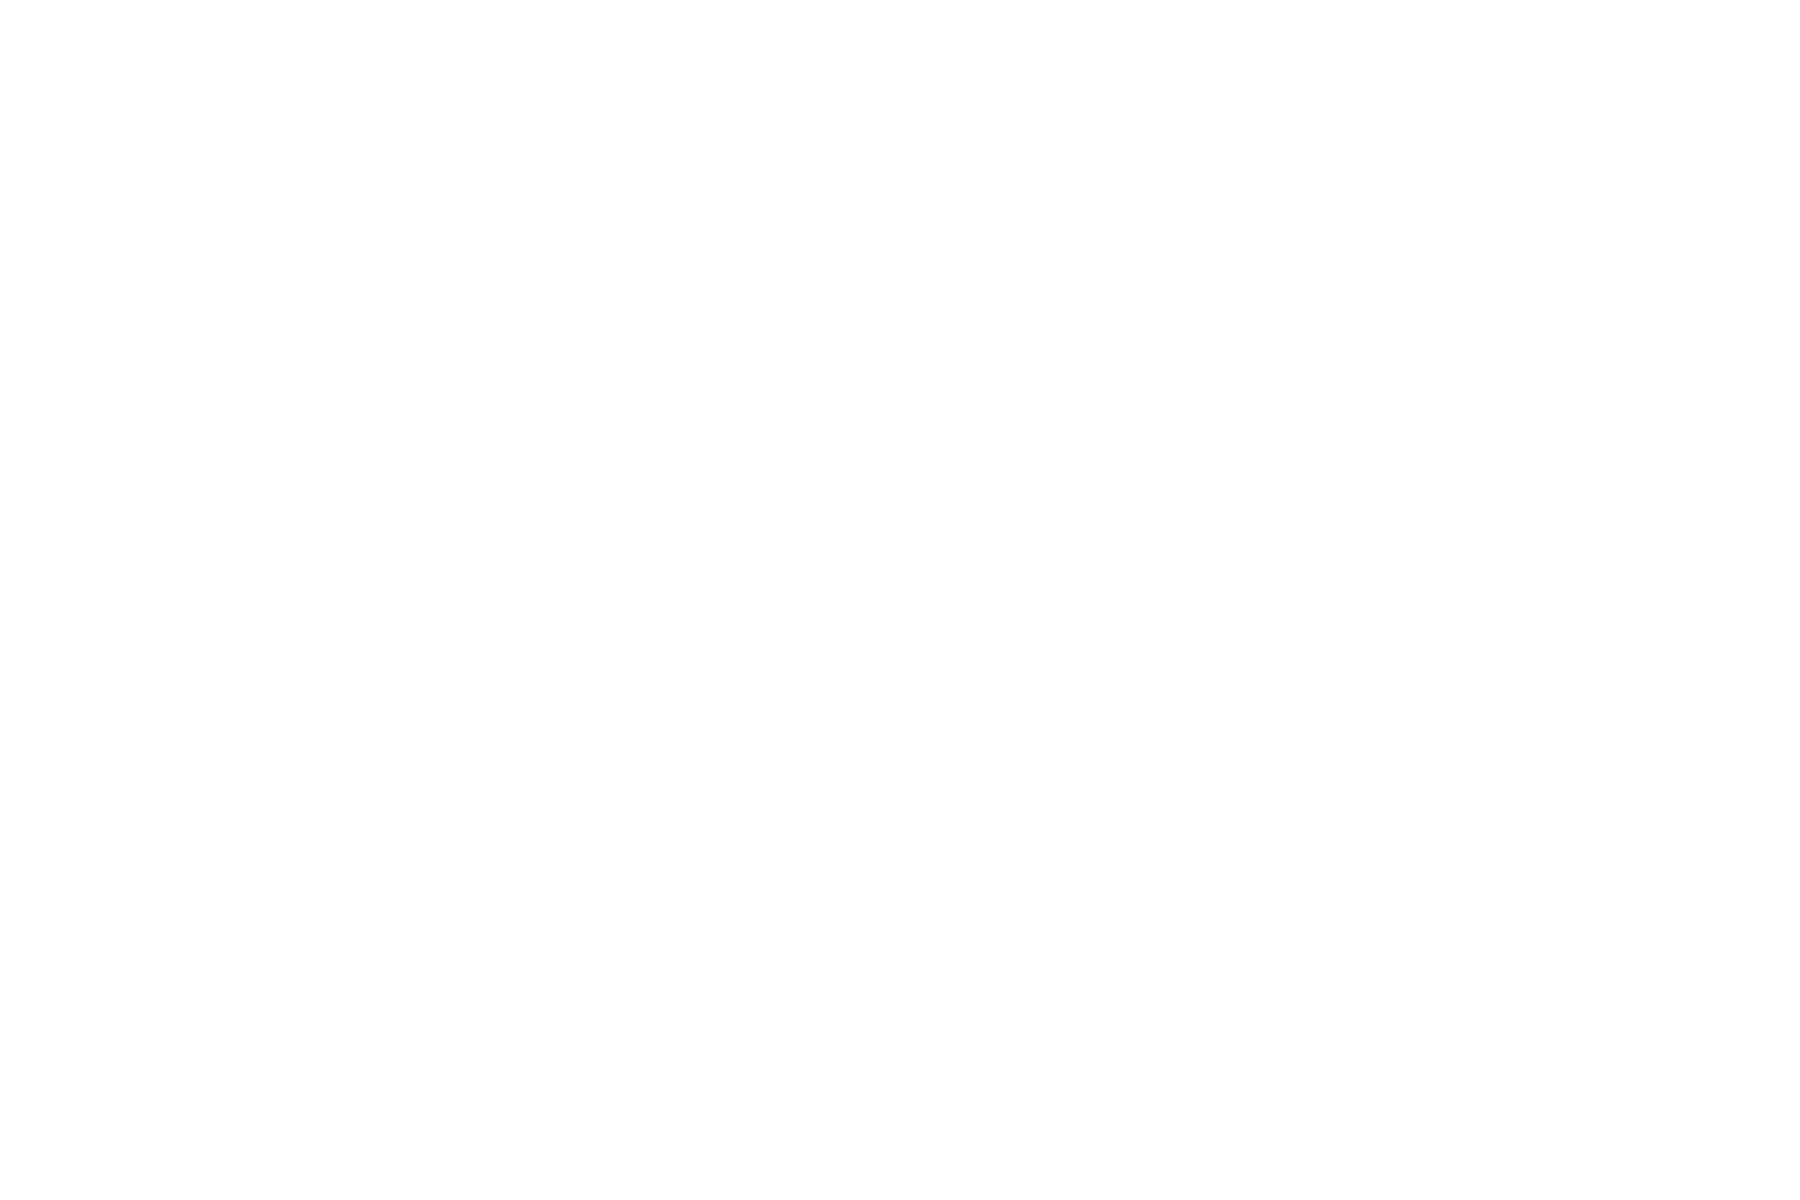 UMR white.png